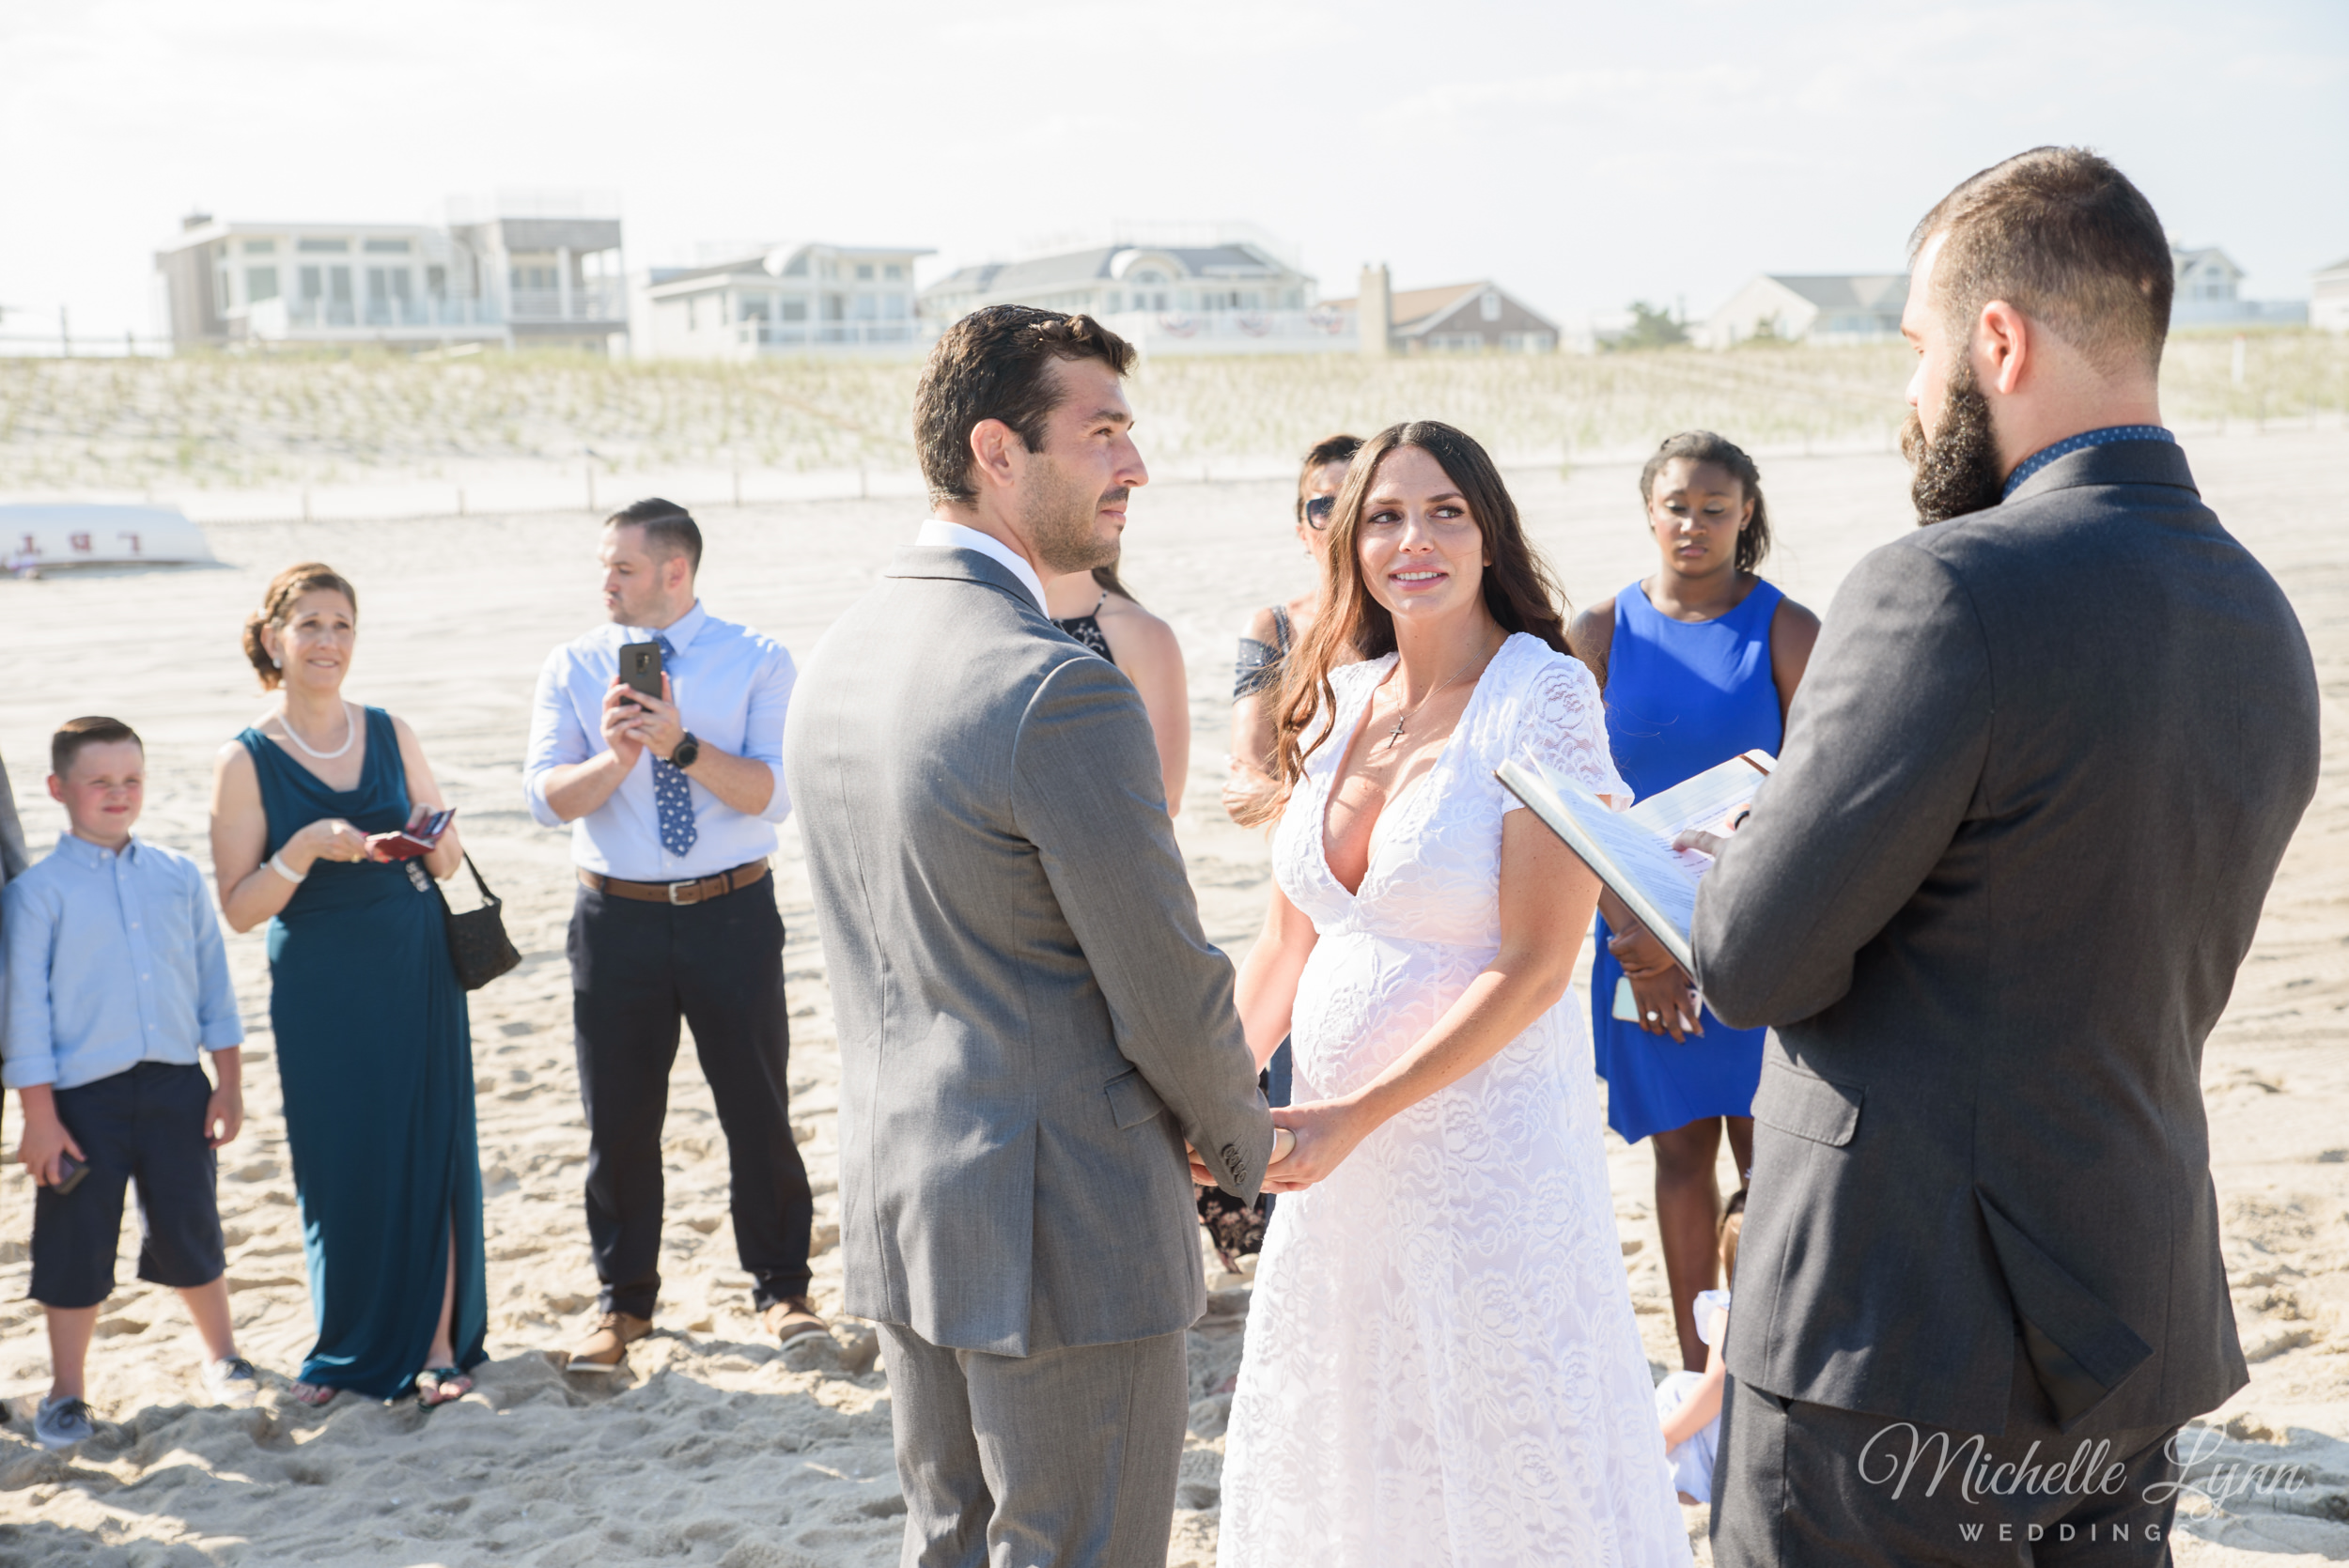 mlw-brant-beach-lbi-wedding-photography-29.jpg